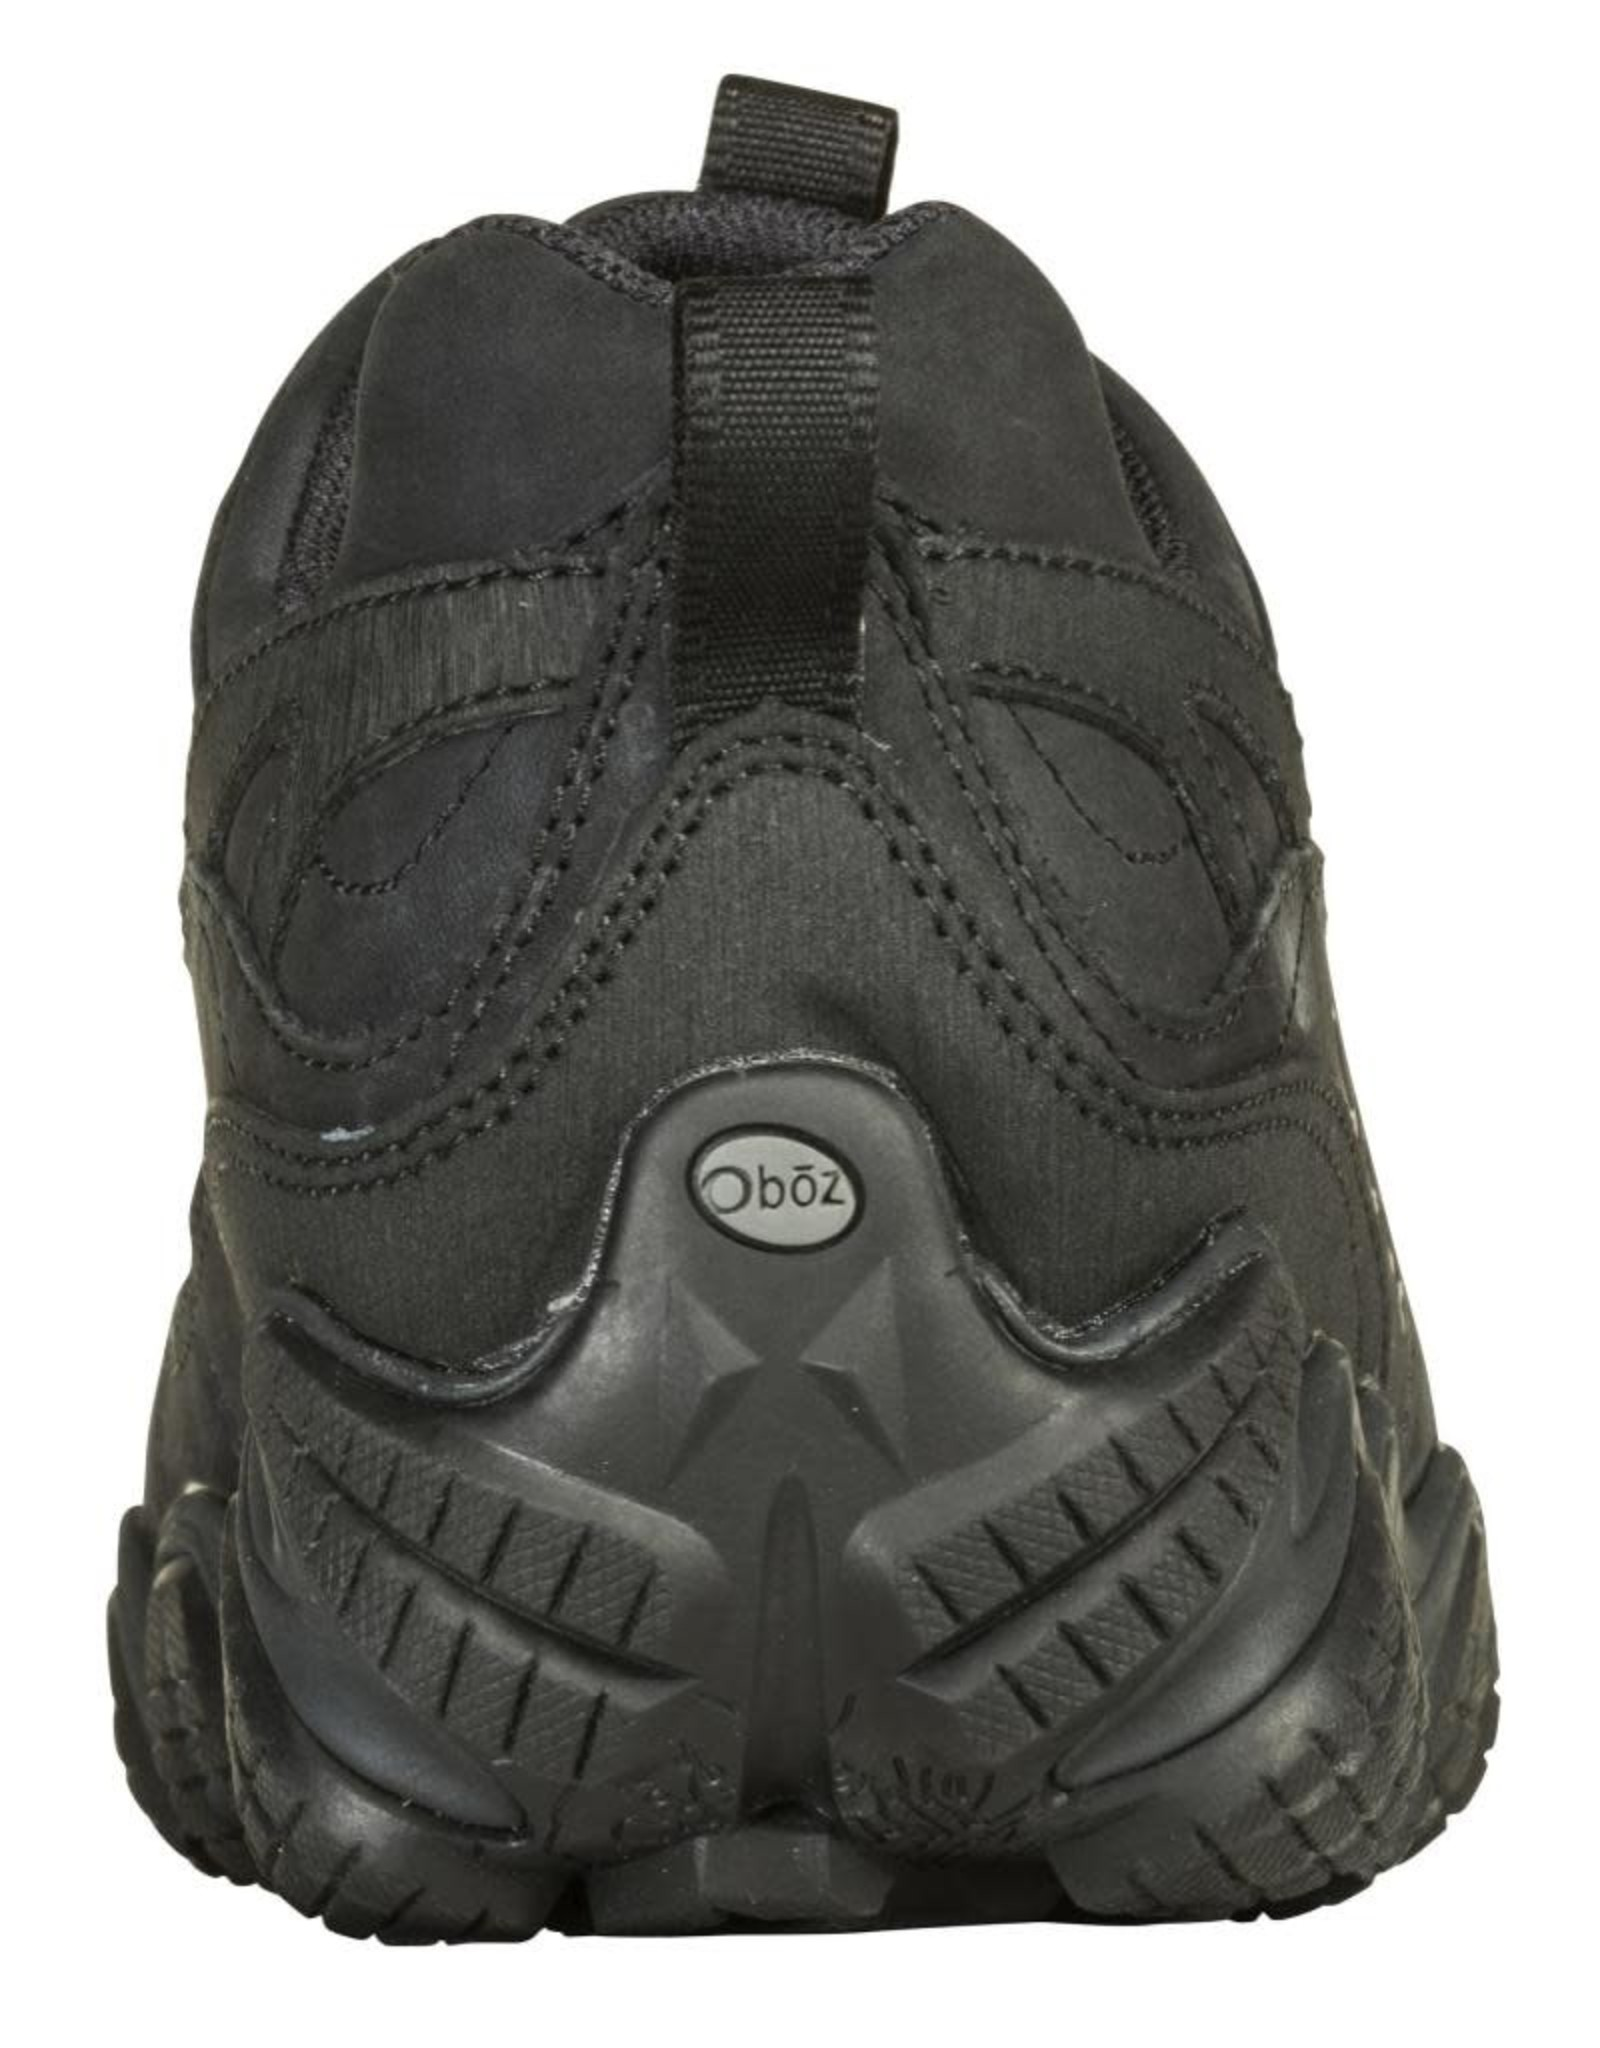 Oboz Men's Firebrand II Low Leather